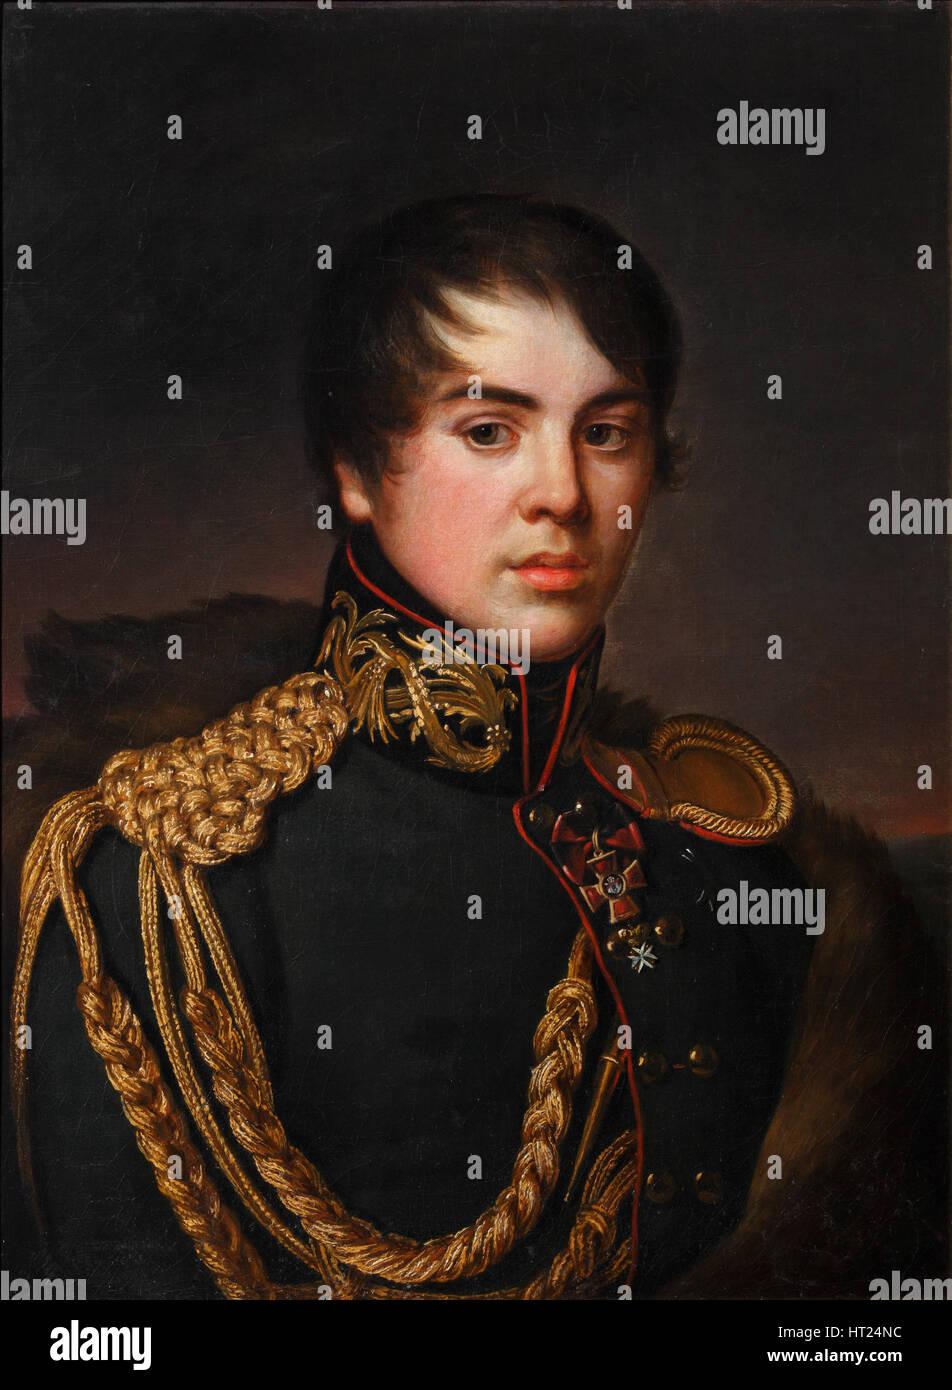 Portrait of Count Vladimir Stepanovich Apraksin (1796-1833), ca 1812. Artist: Svintsov, S.S. (active 1810s) - Stock Image